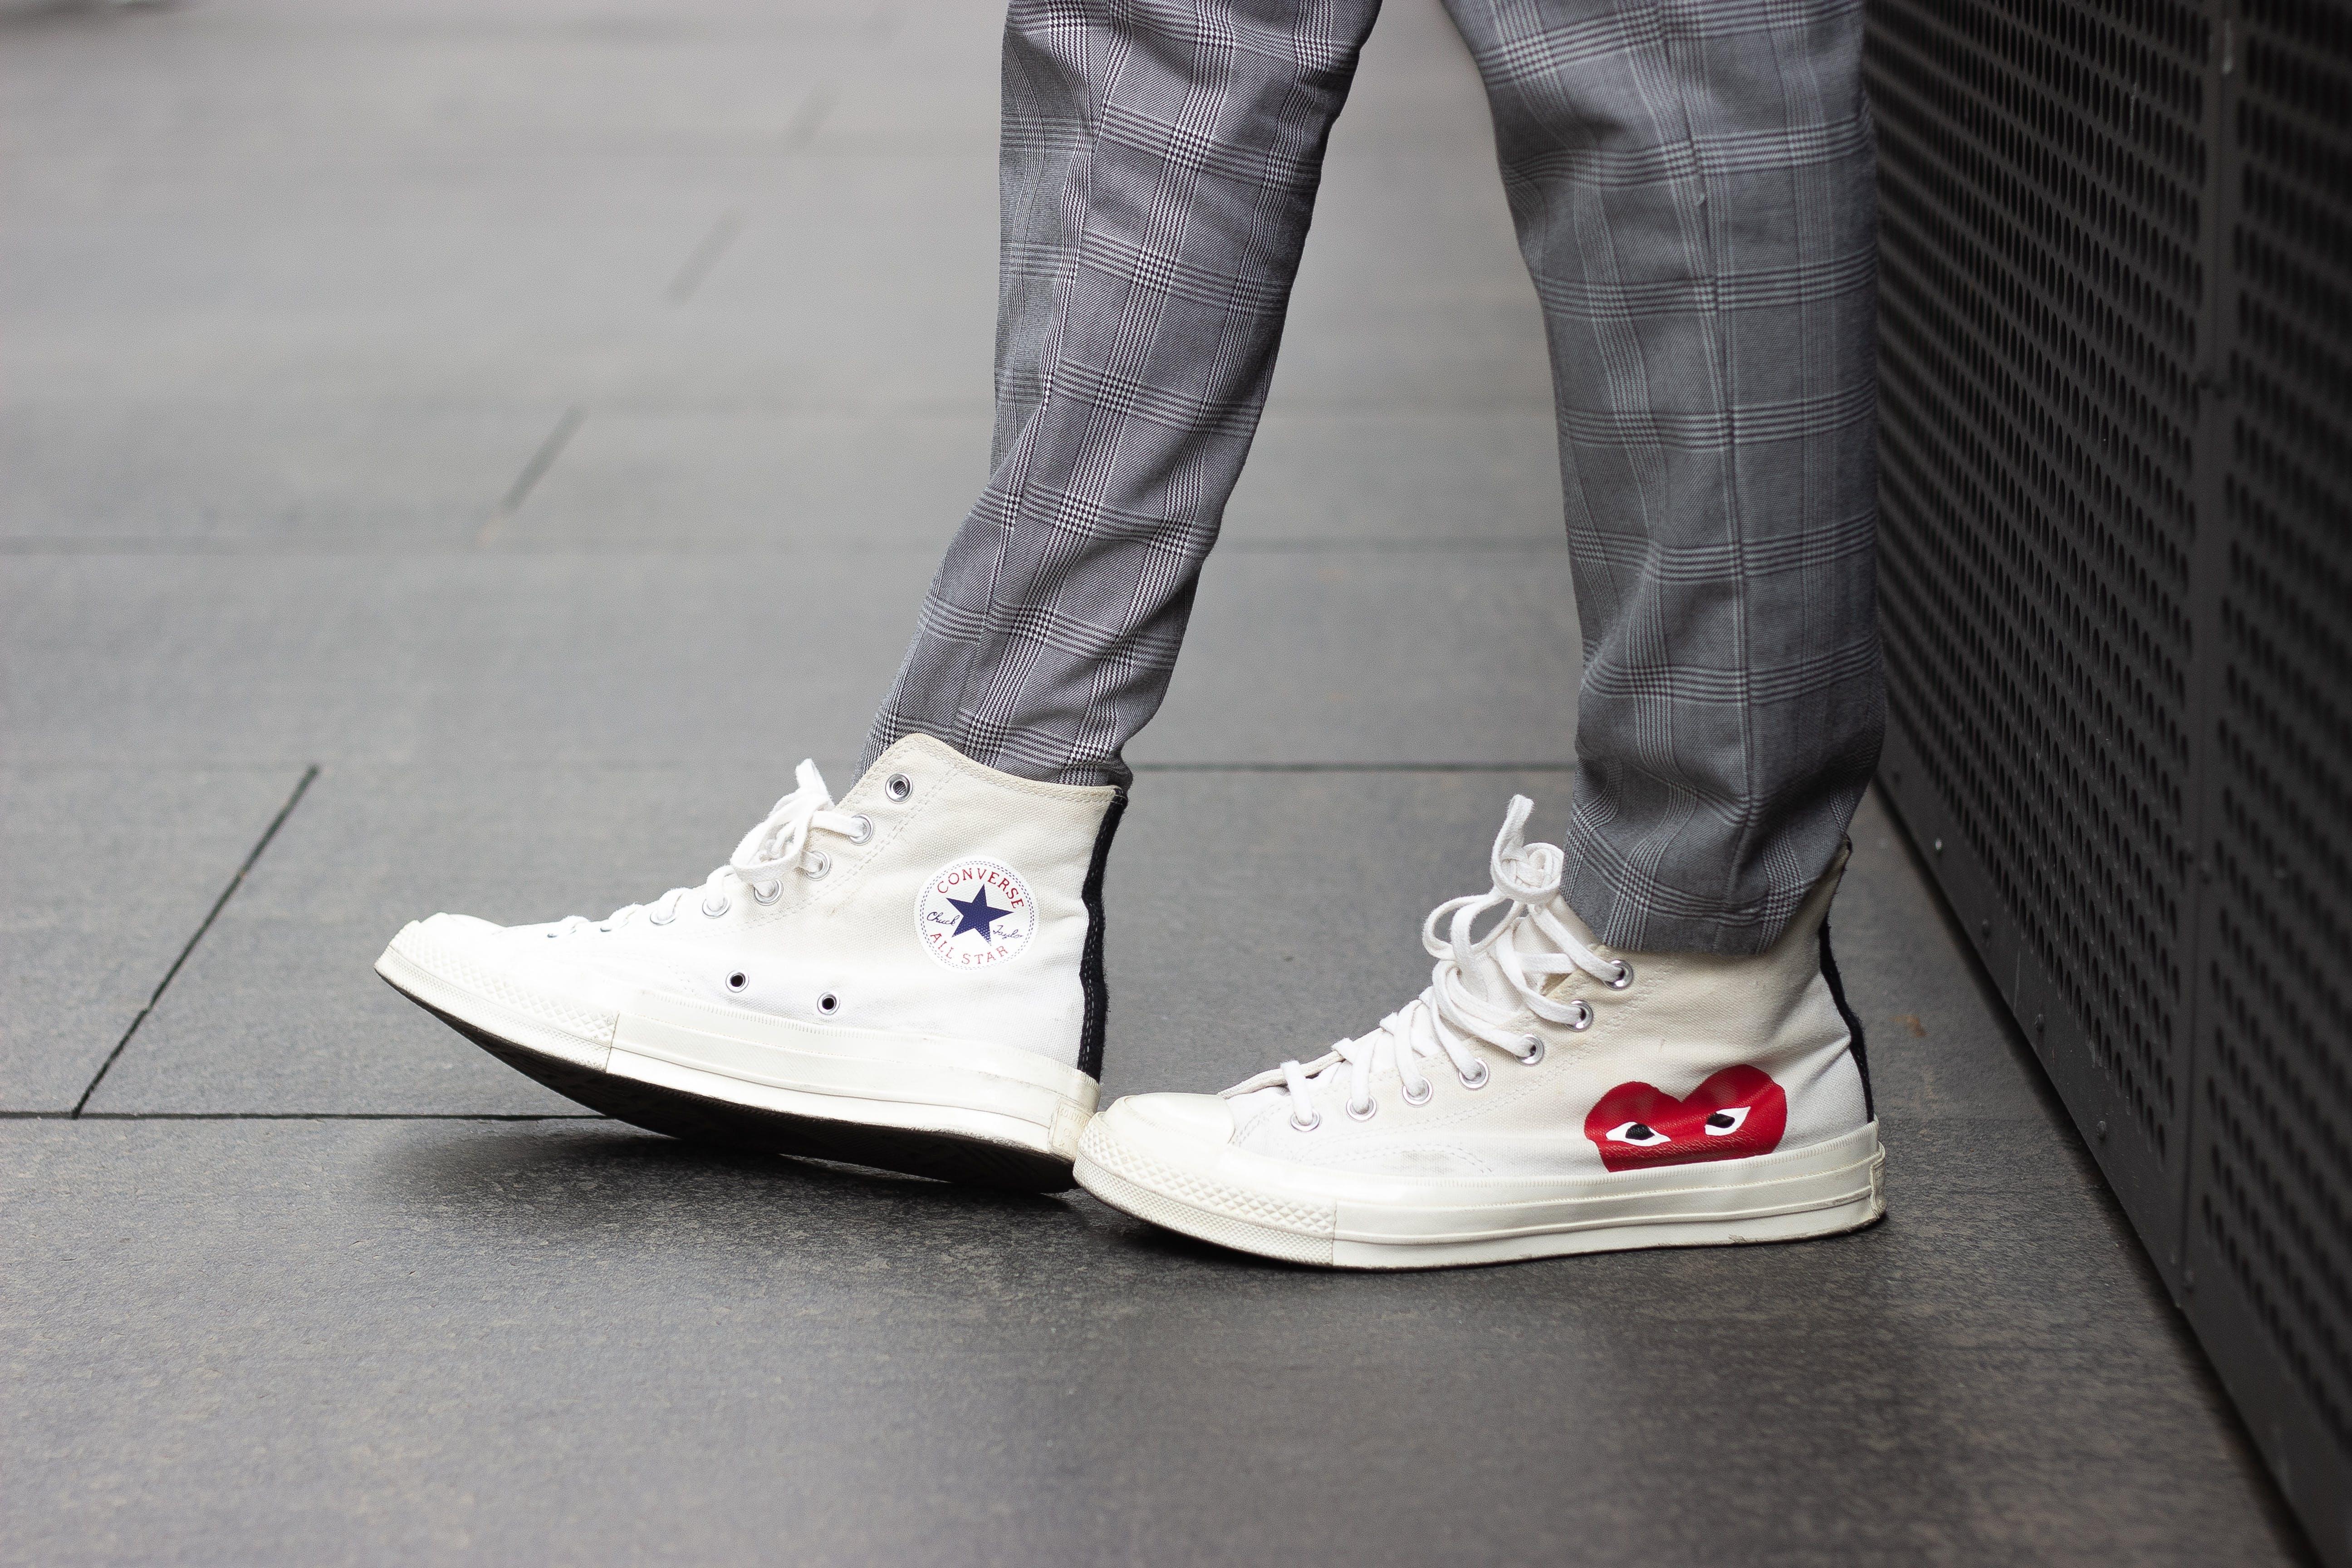 Free stock photo of all star, black shoes, brazil, brazilian